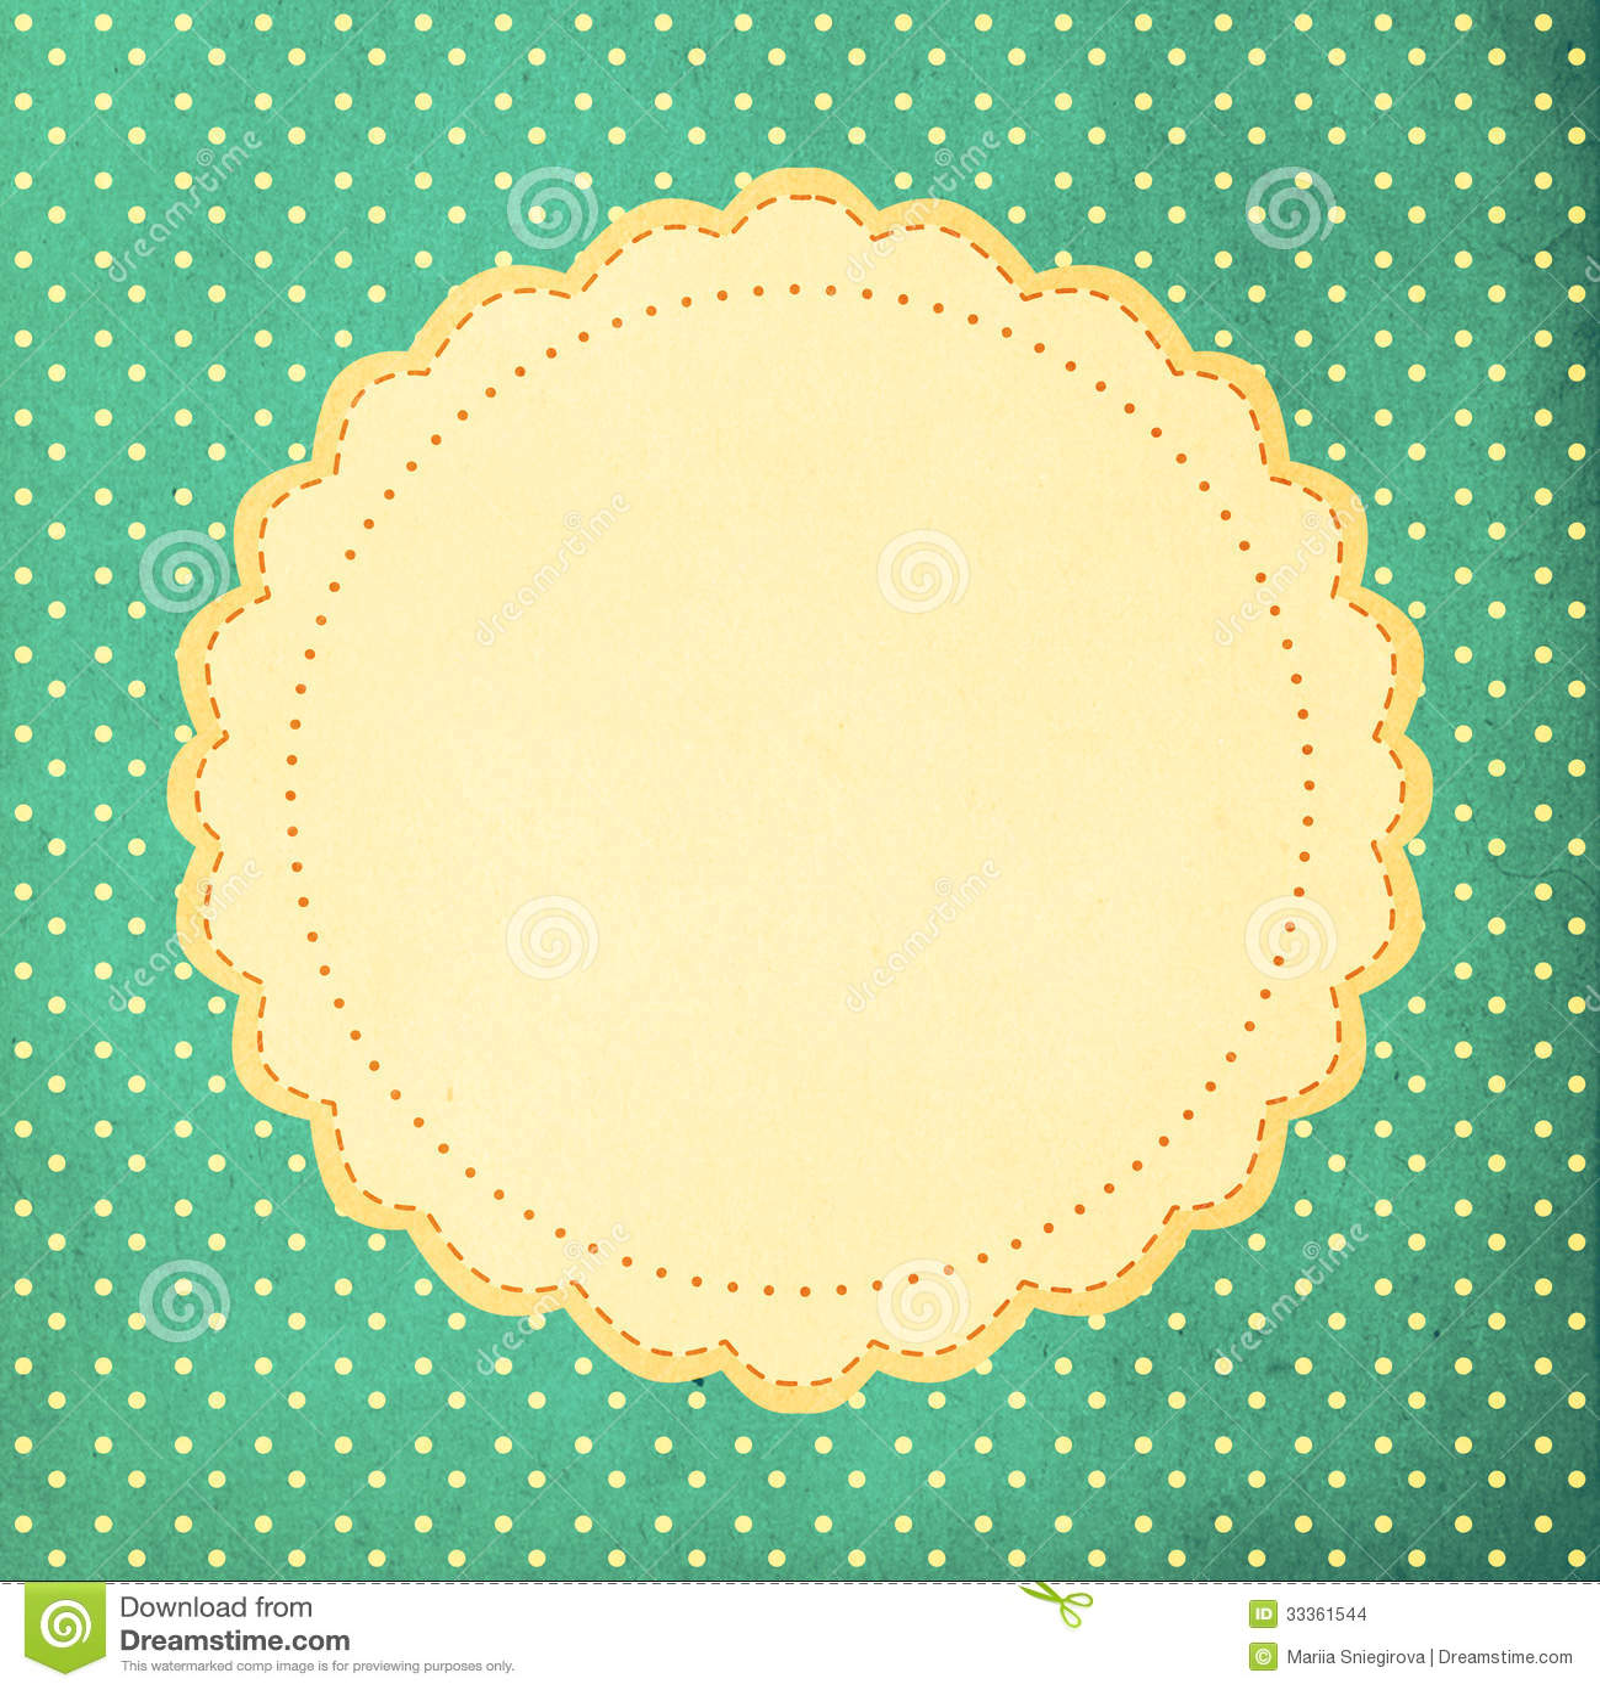 vintage background polka dot style stock images image